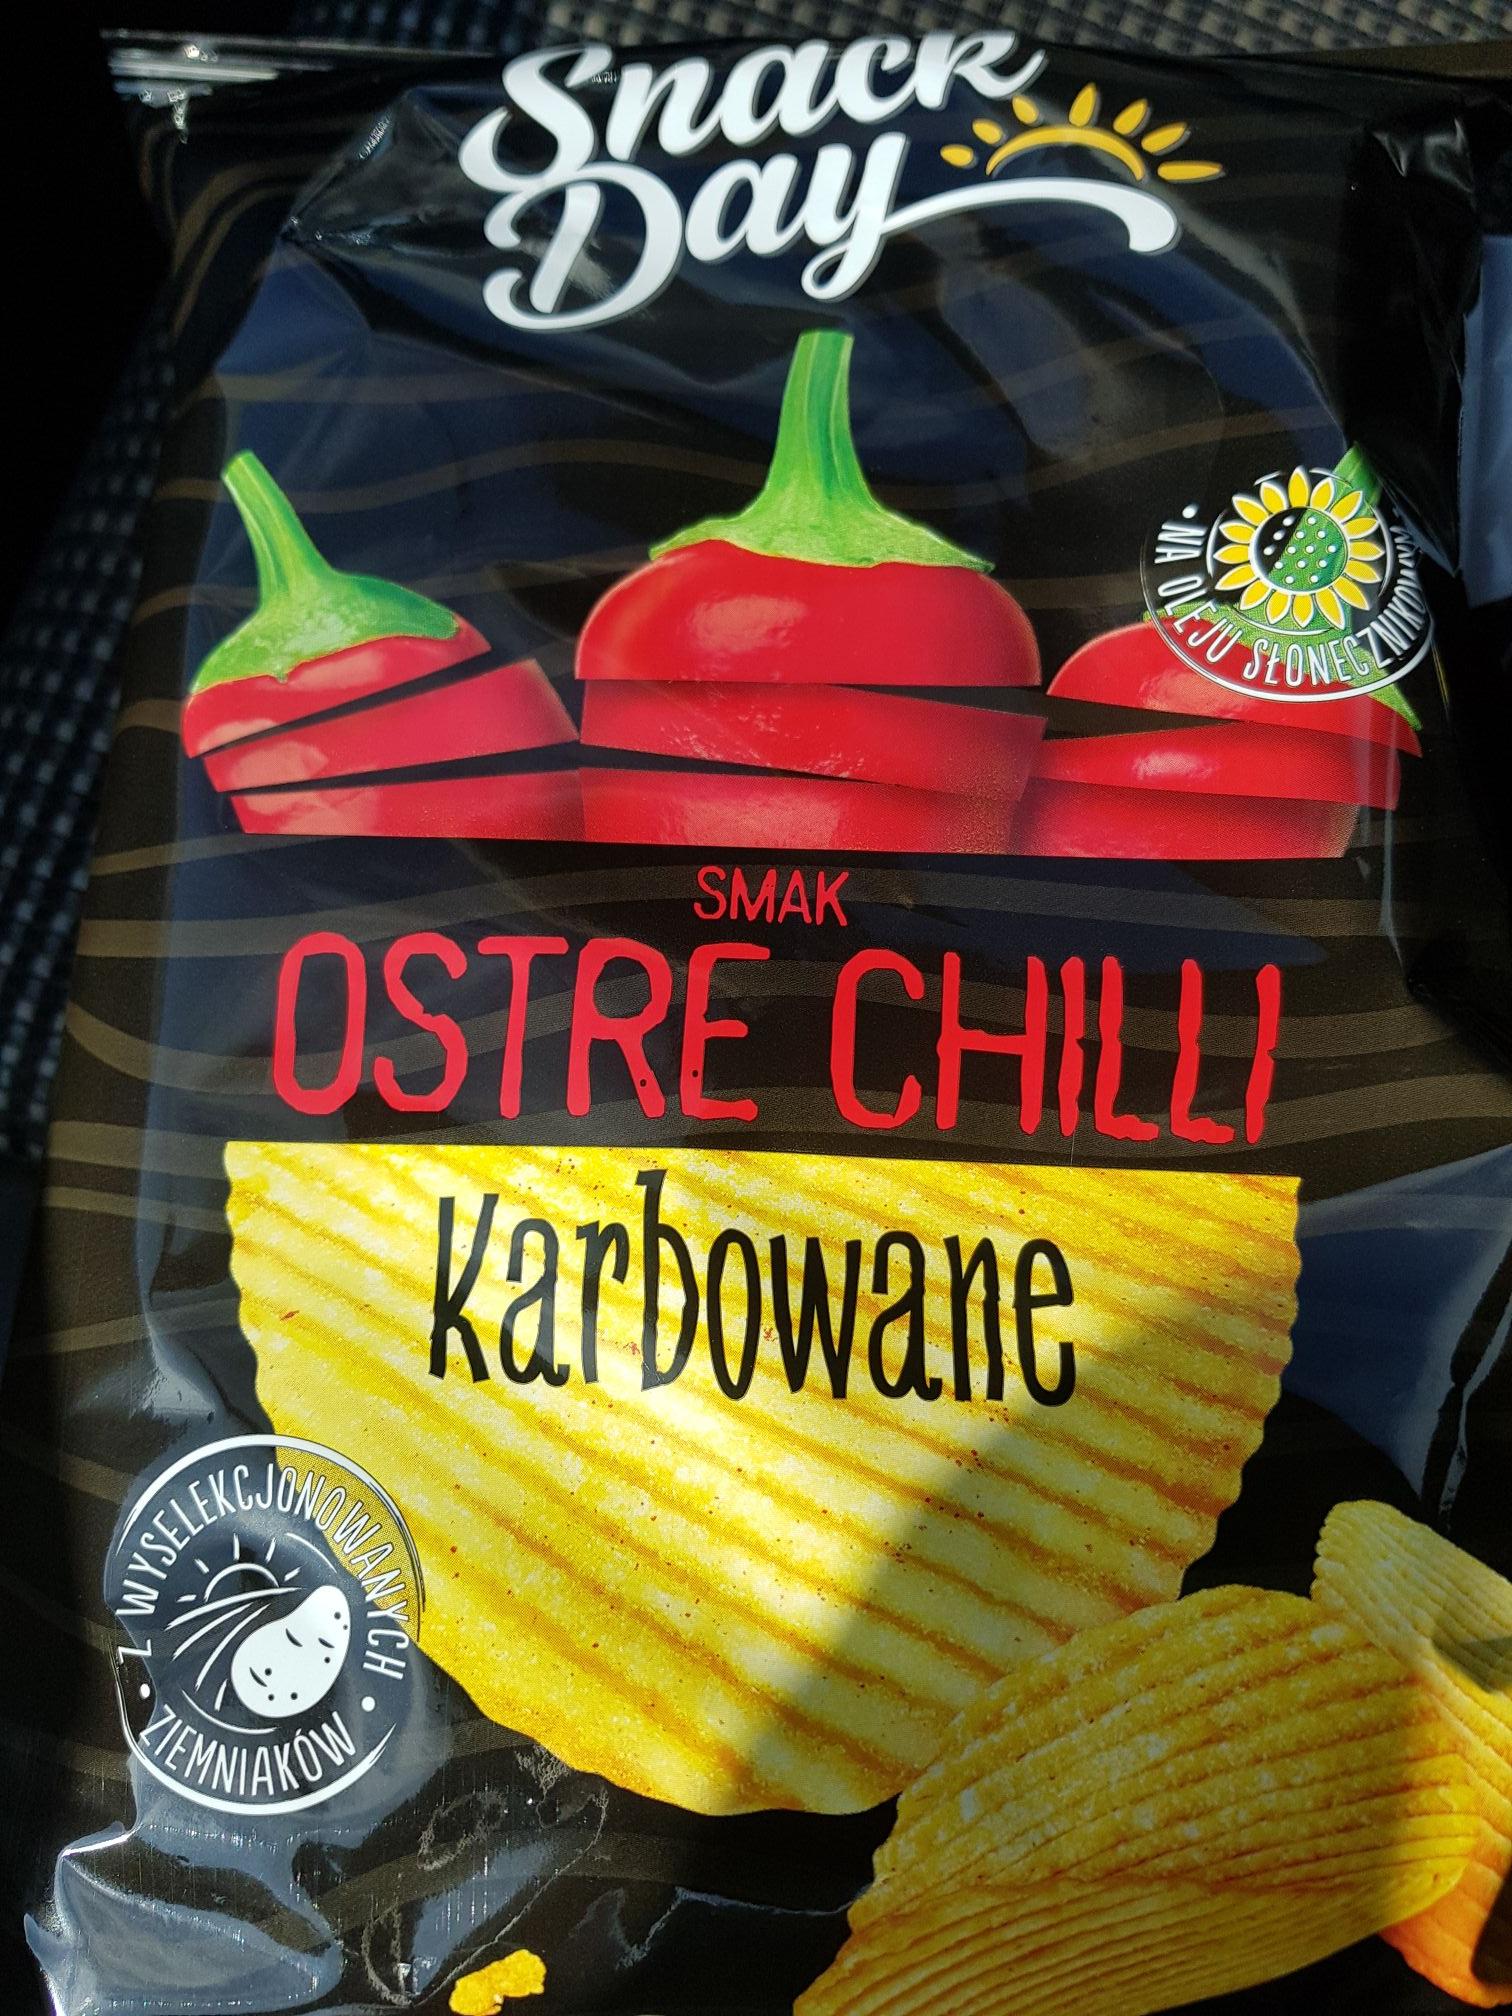 Chipsy Snack Day ostre chilli karbowane Lidl